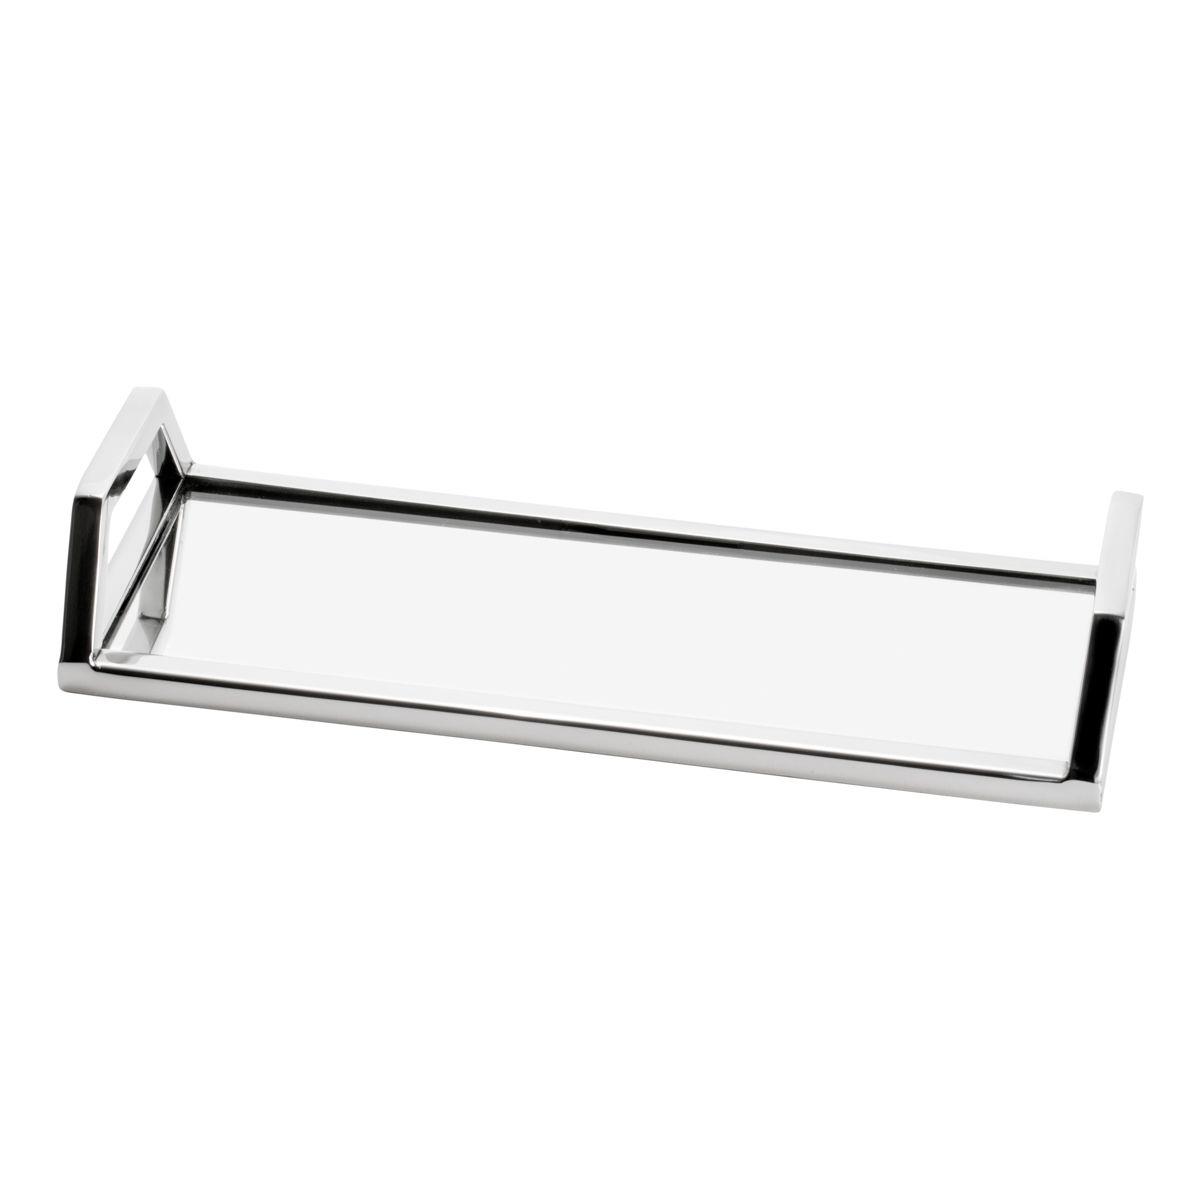 Bandeja Aço Inox Espelhada 30x12x5cm